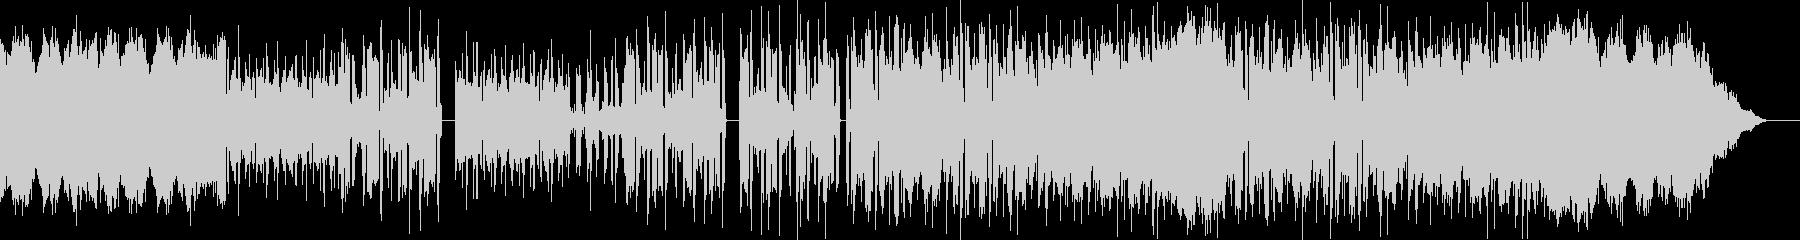 FM音源風フィールド系BGMの未再生の波形